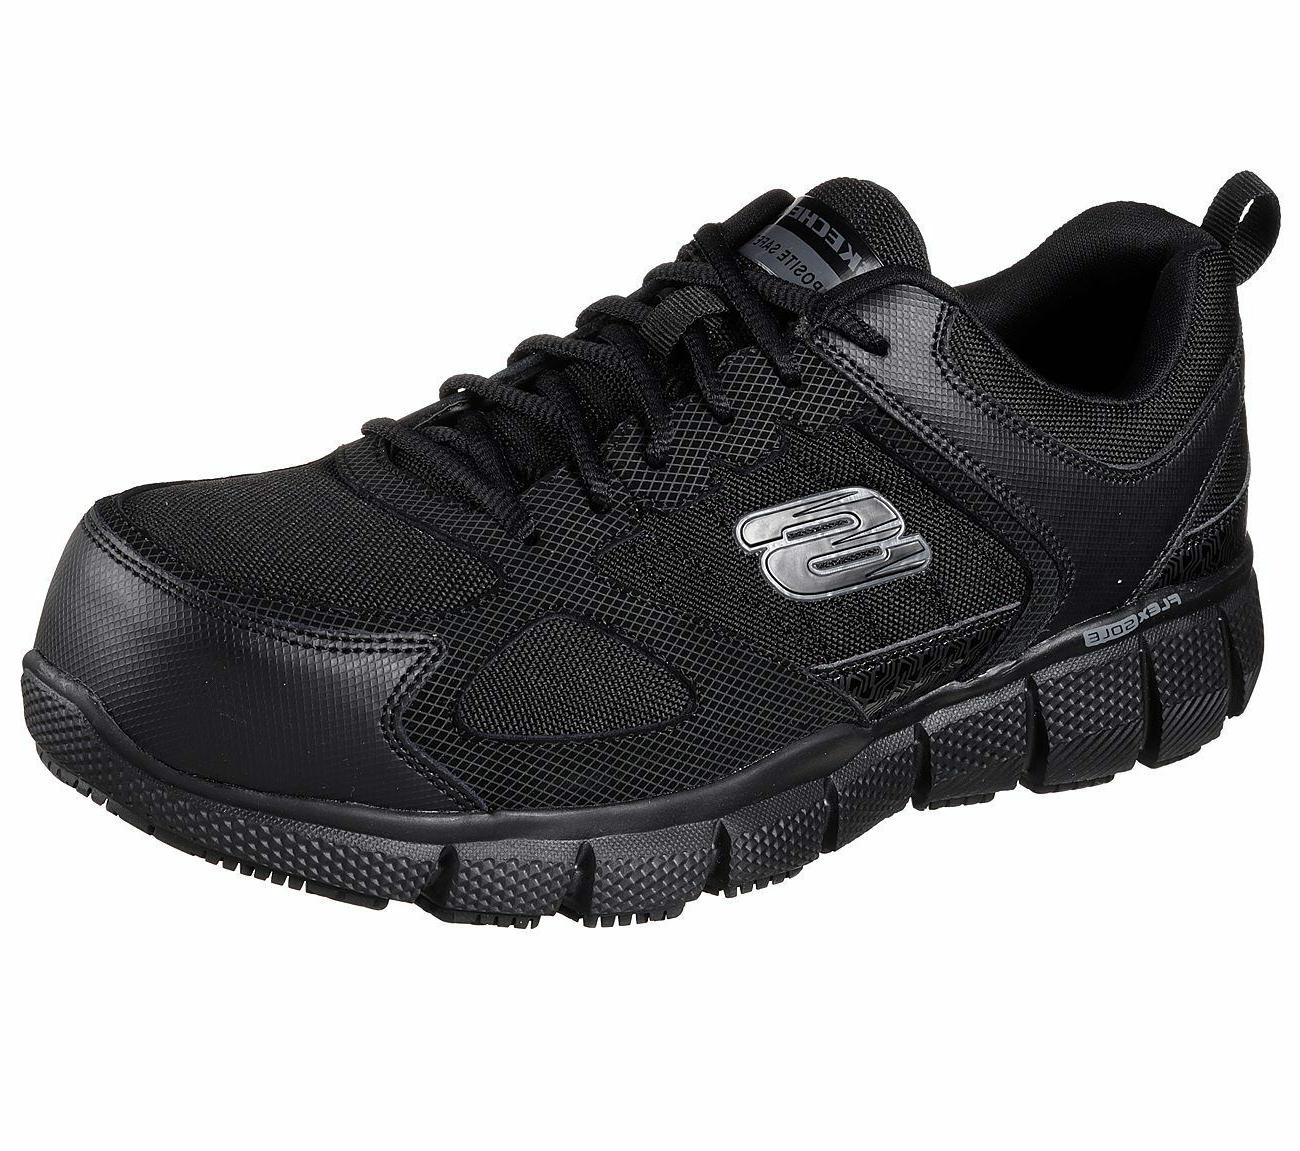 77132 wide fit black shoes work men